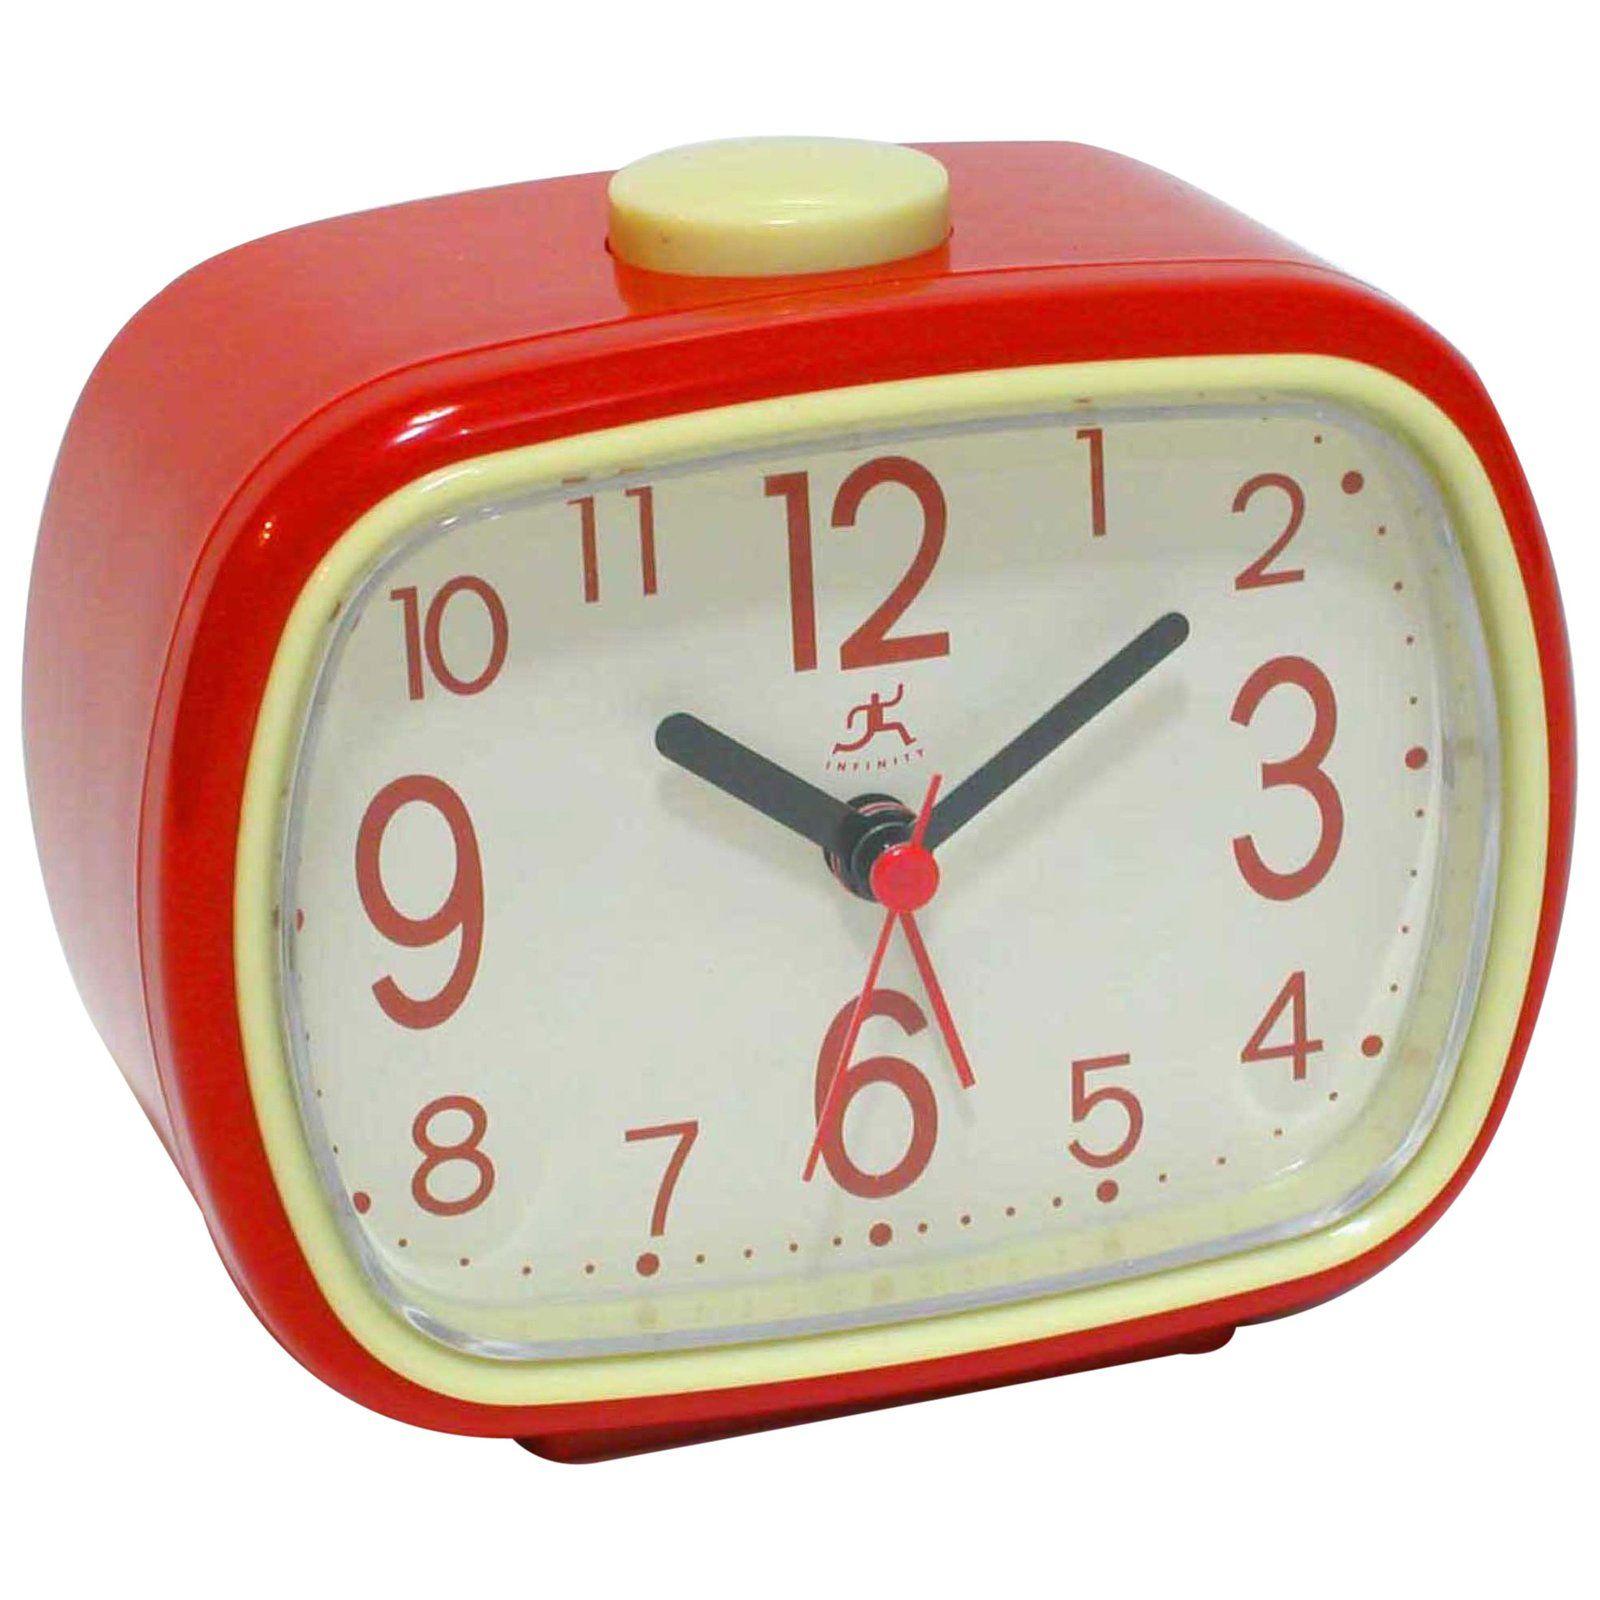 Vintage Alarm Clock Retro Alarm Clock Modern Alarm Clock